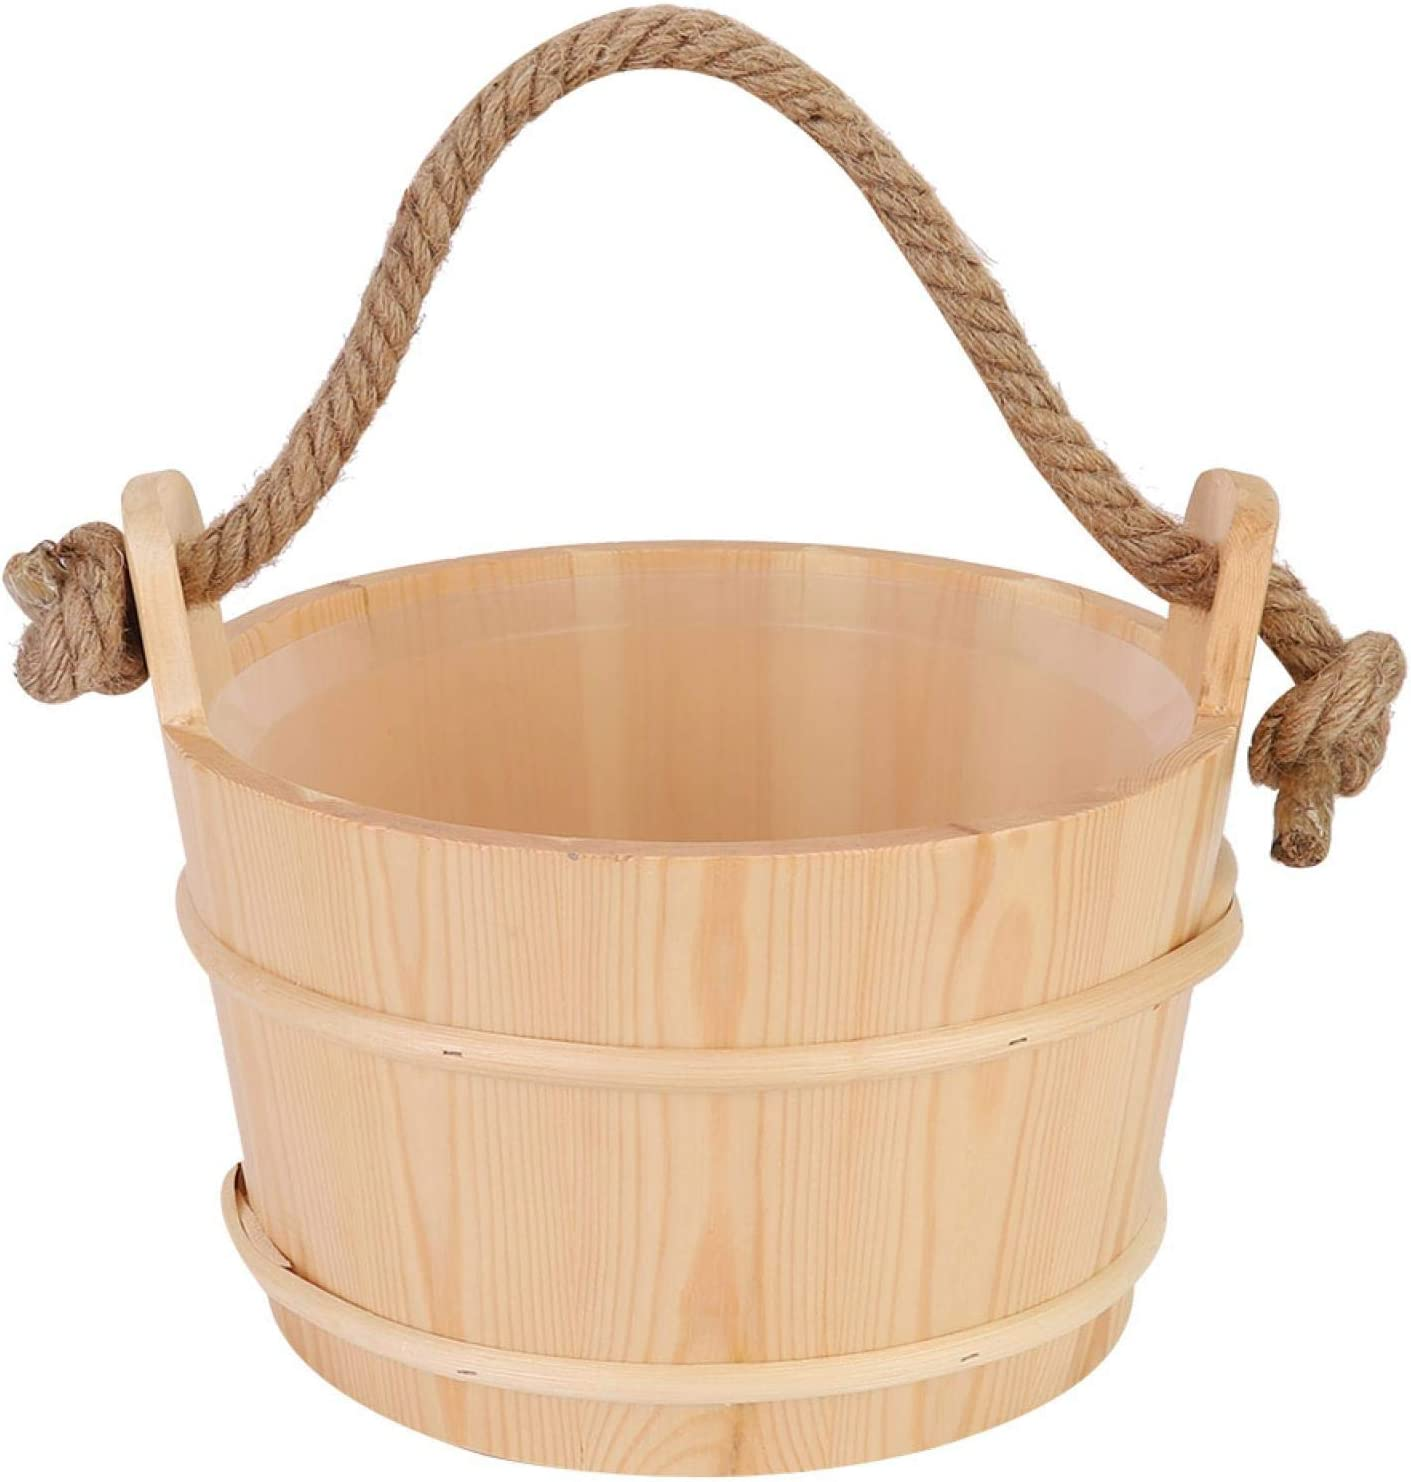 6L Sauna Bucket Barrel Popularity Wooden Accessories for Spa Shower S Max 60% OFF